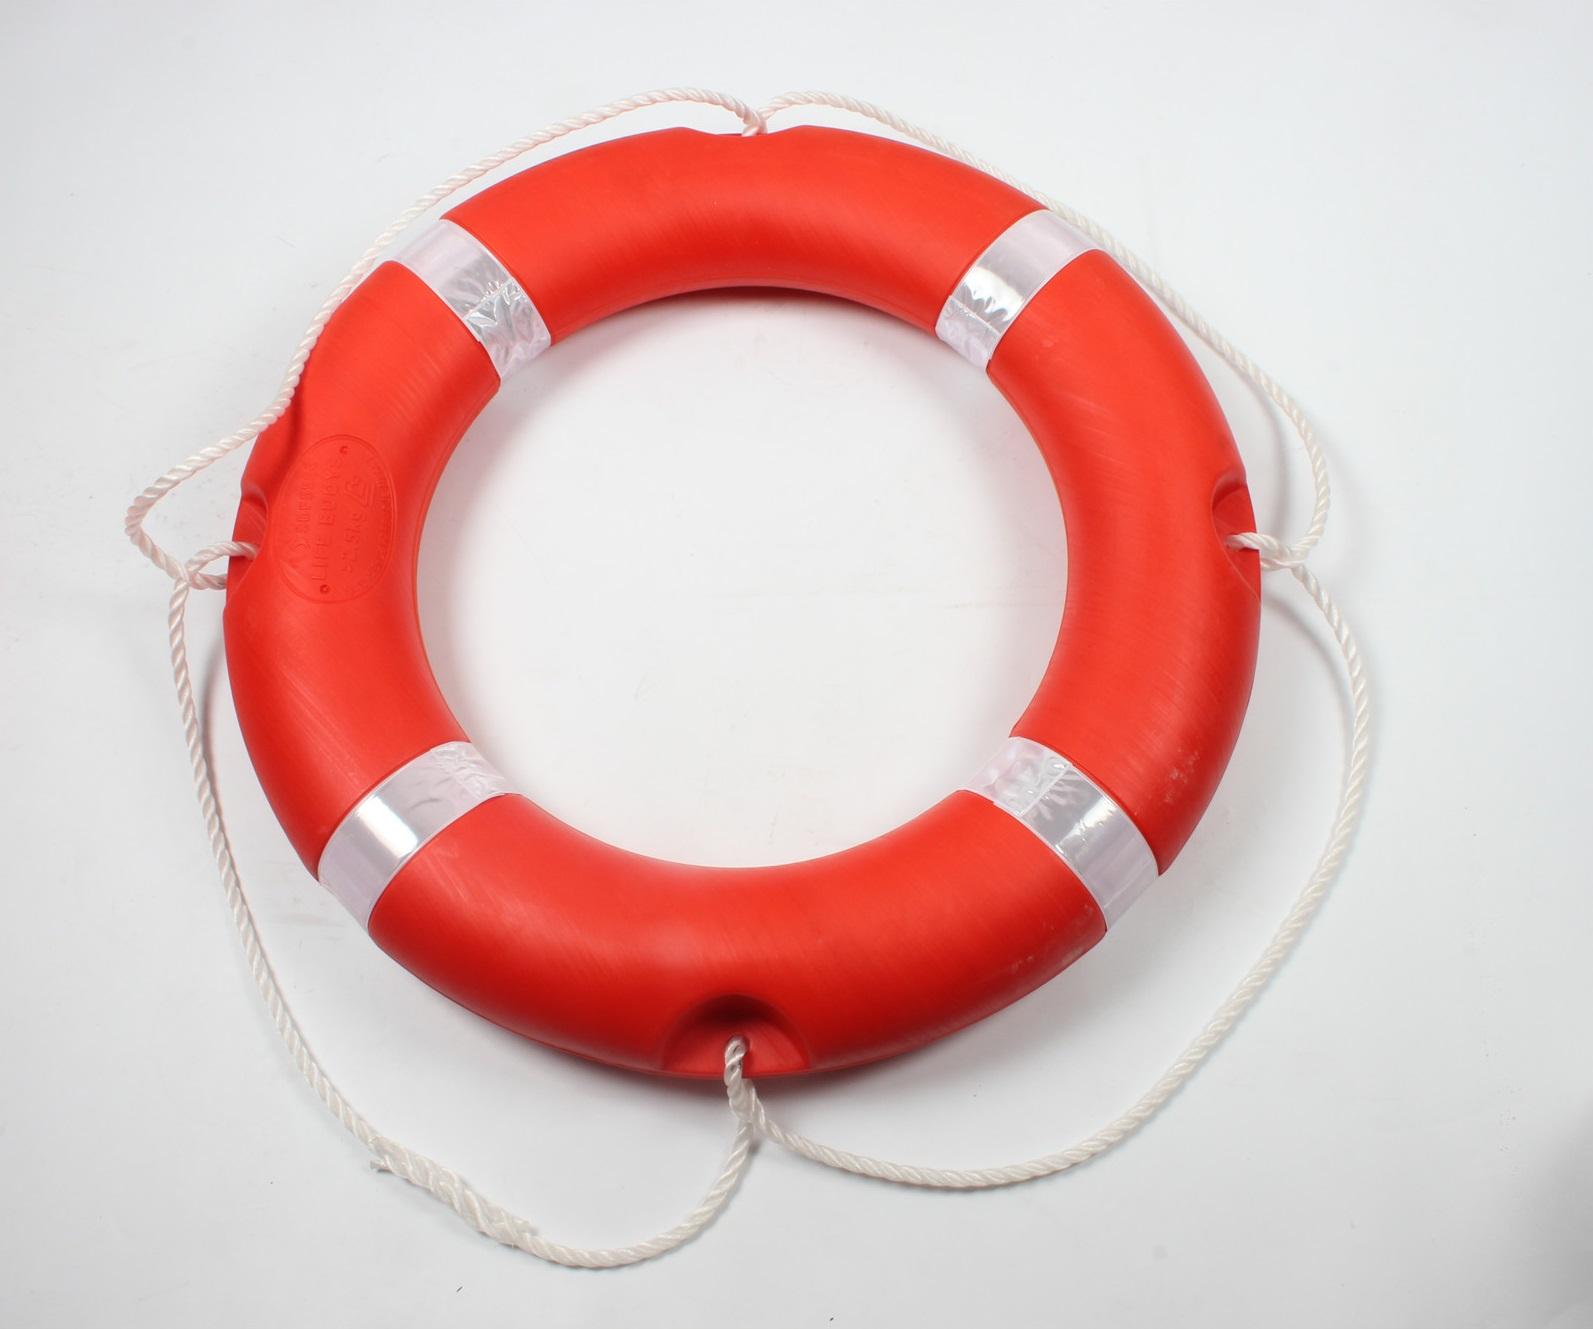 Solas Approved Life Buoy 2.5KG/4.3KG